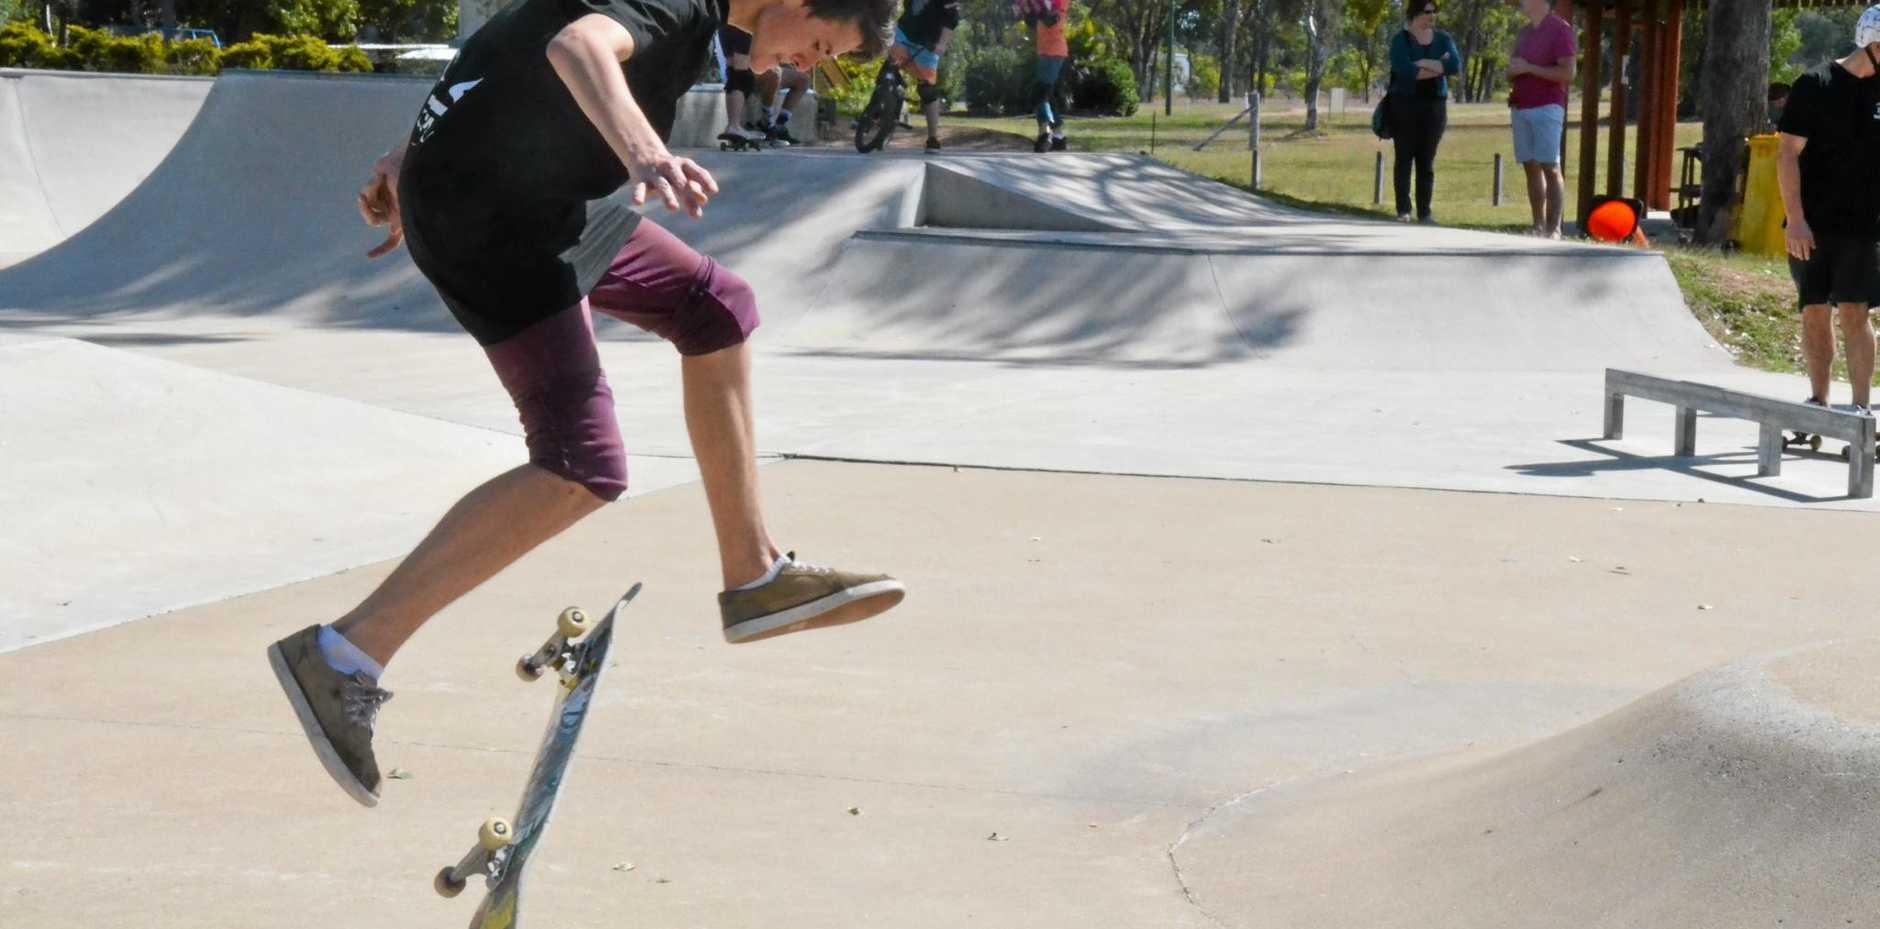 SKILLED RIDER: Nicholas Wenck making tricks look easy.